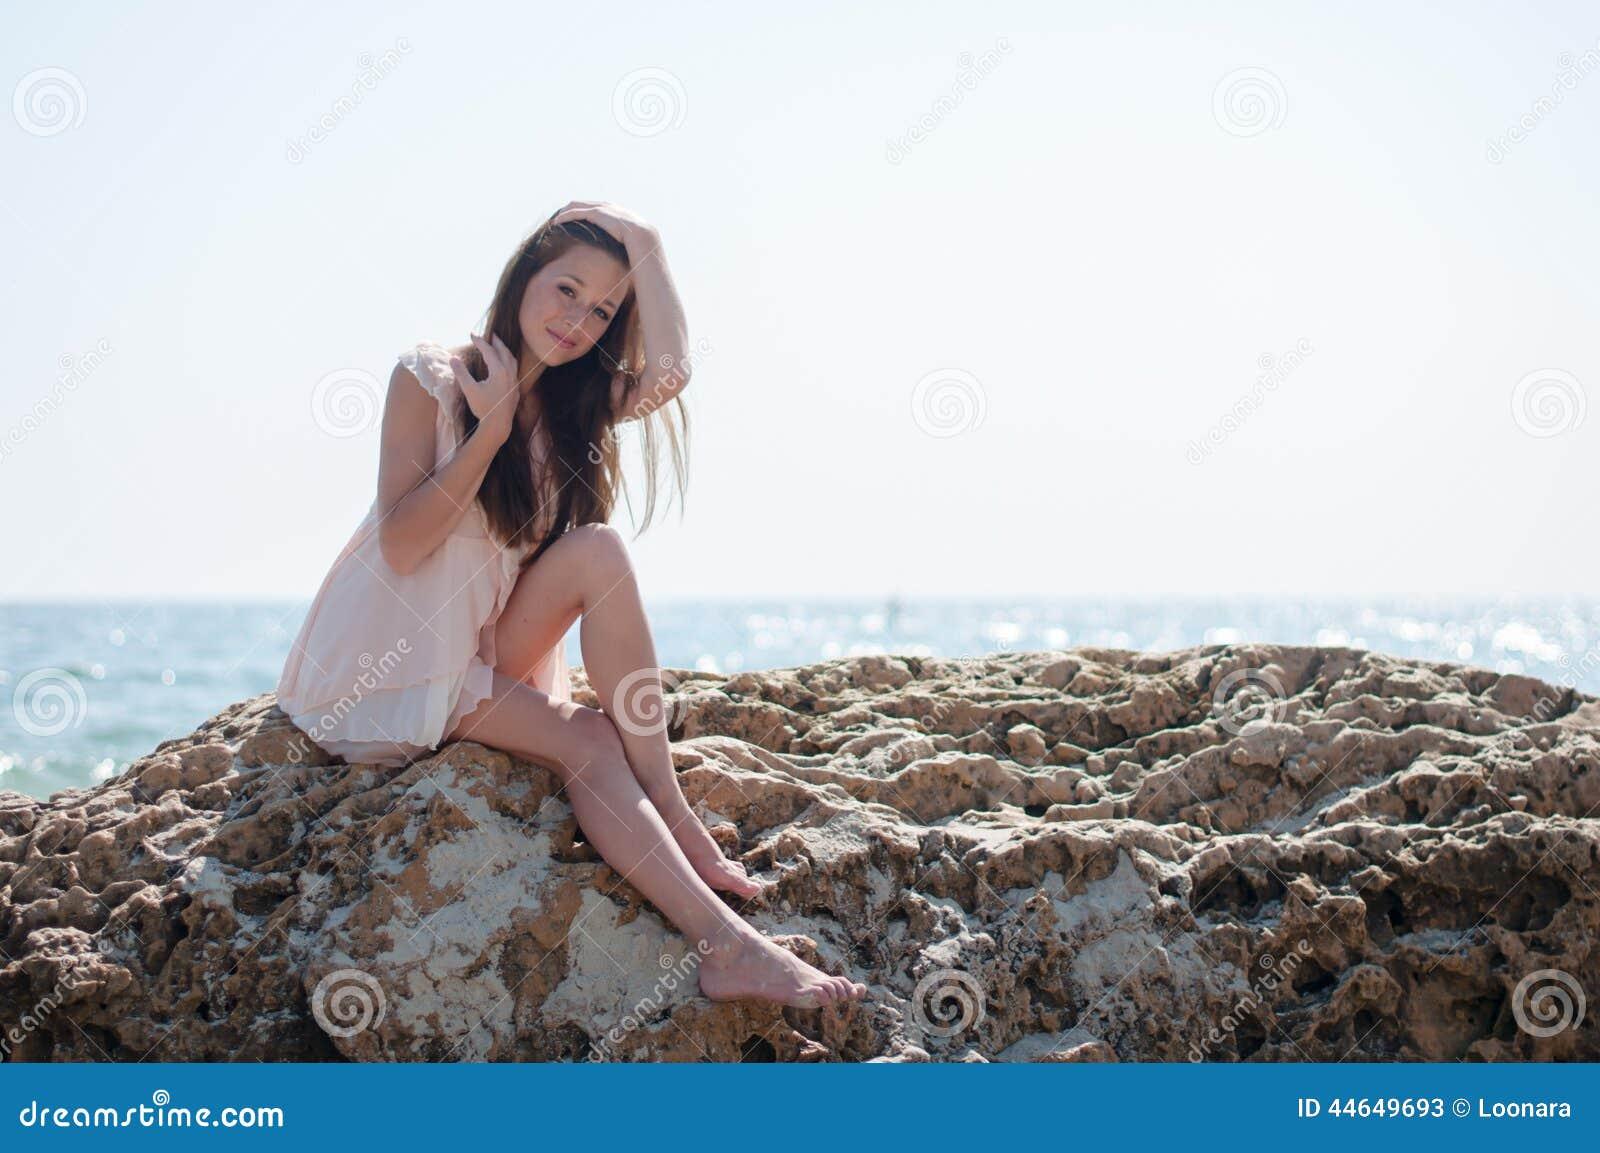 Deal Girl sitting on rock Ukrainian